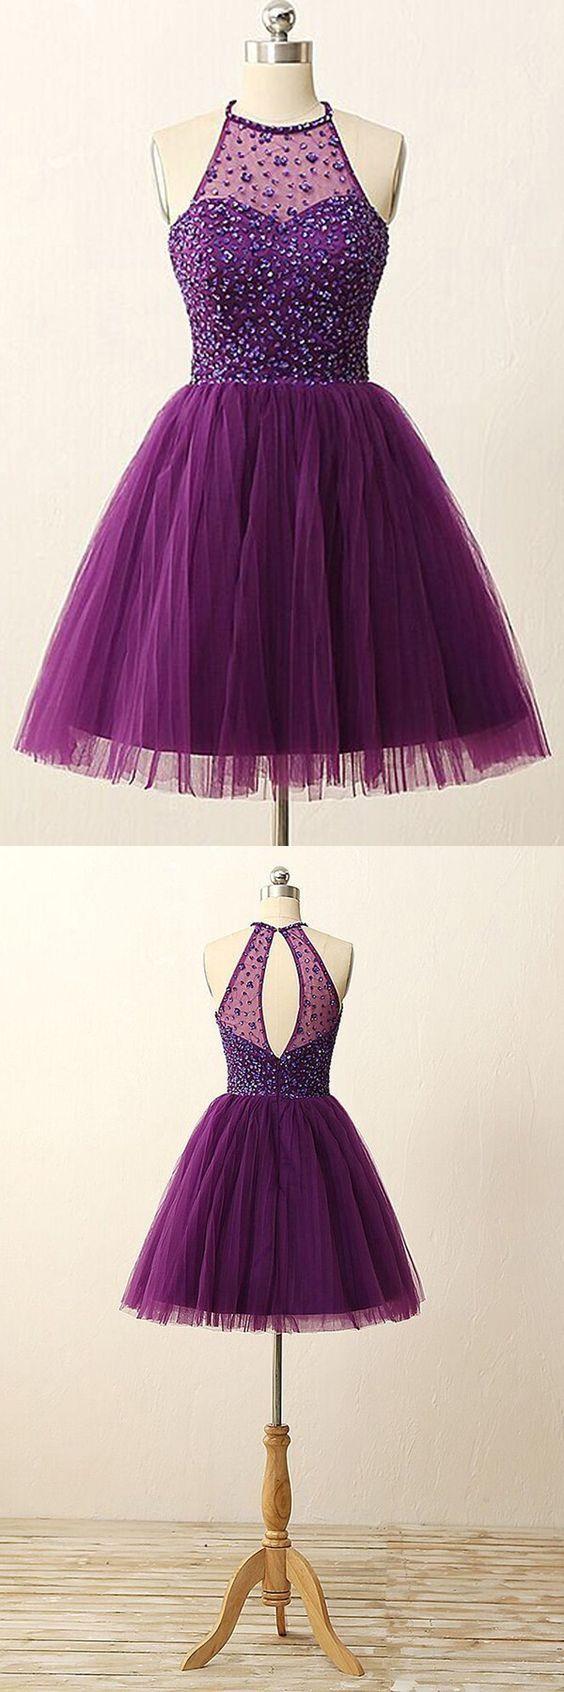 2016 homecoming dresses,homecoming dresses,halter homecoming dresses,purple…: